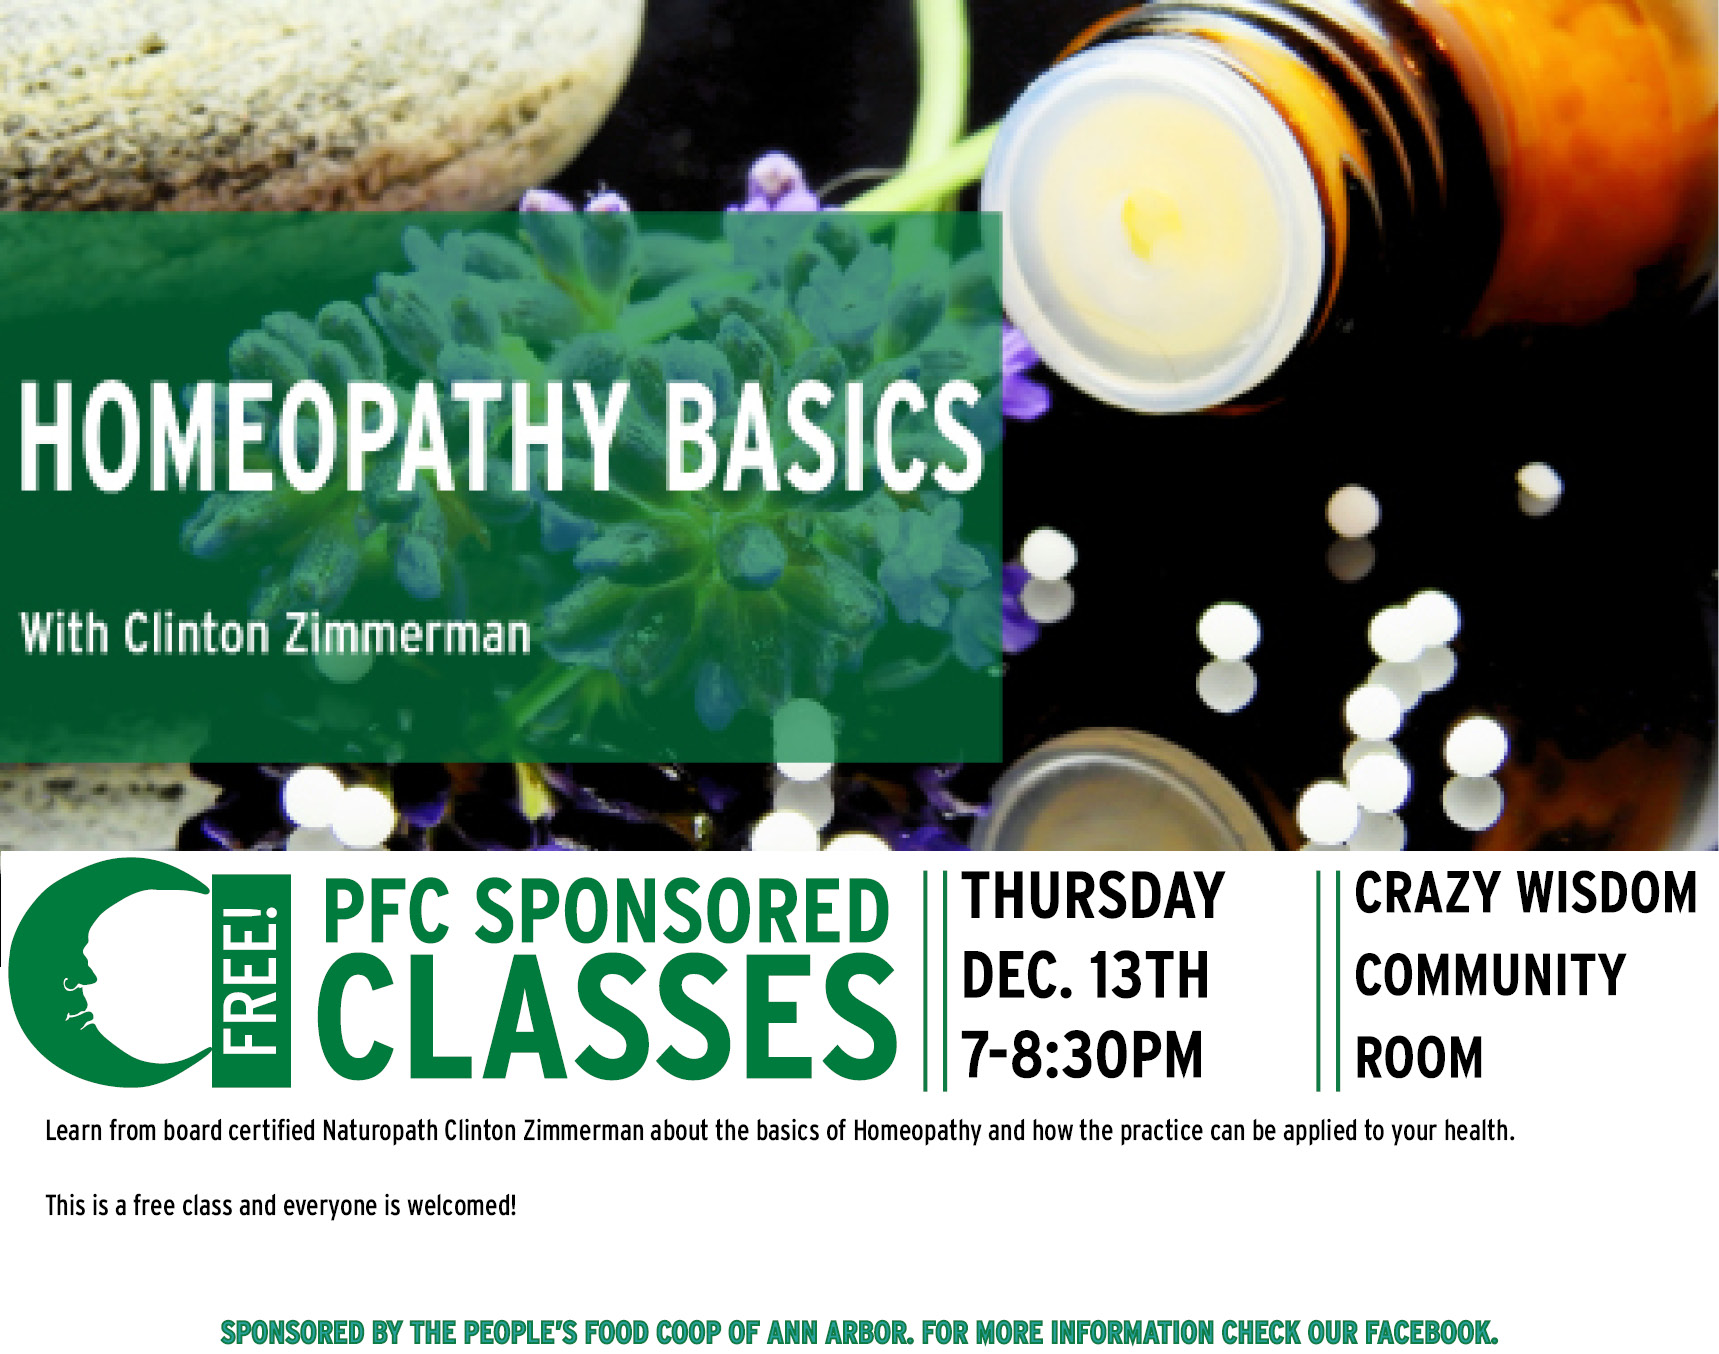 Homeopathy Basics